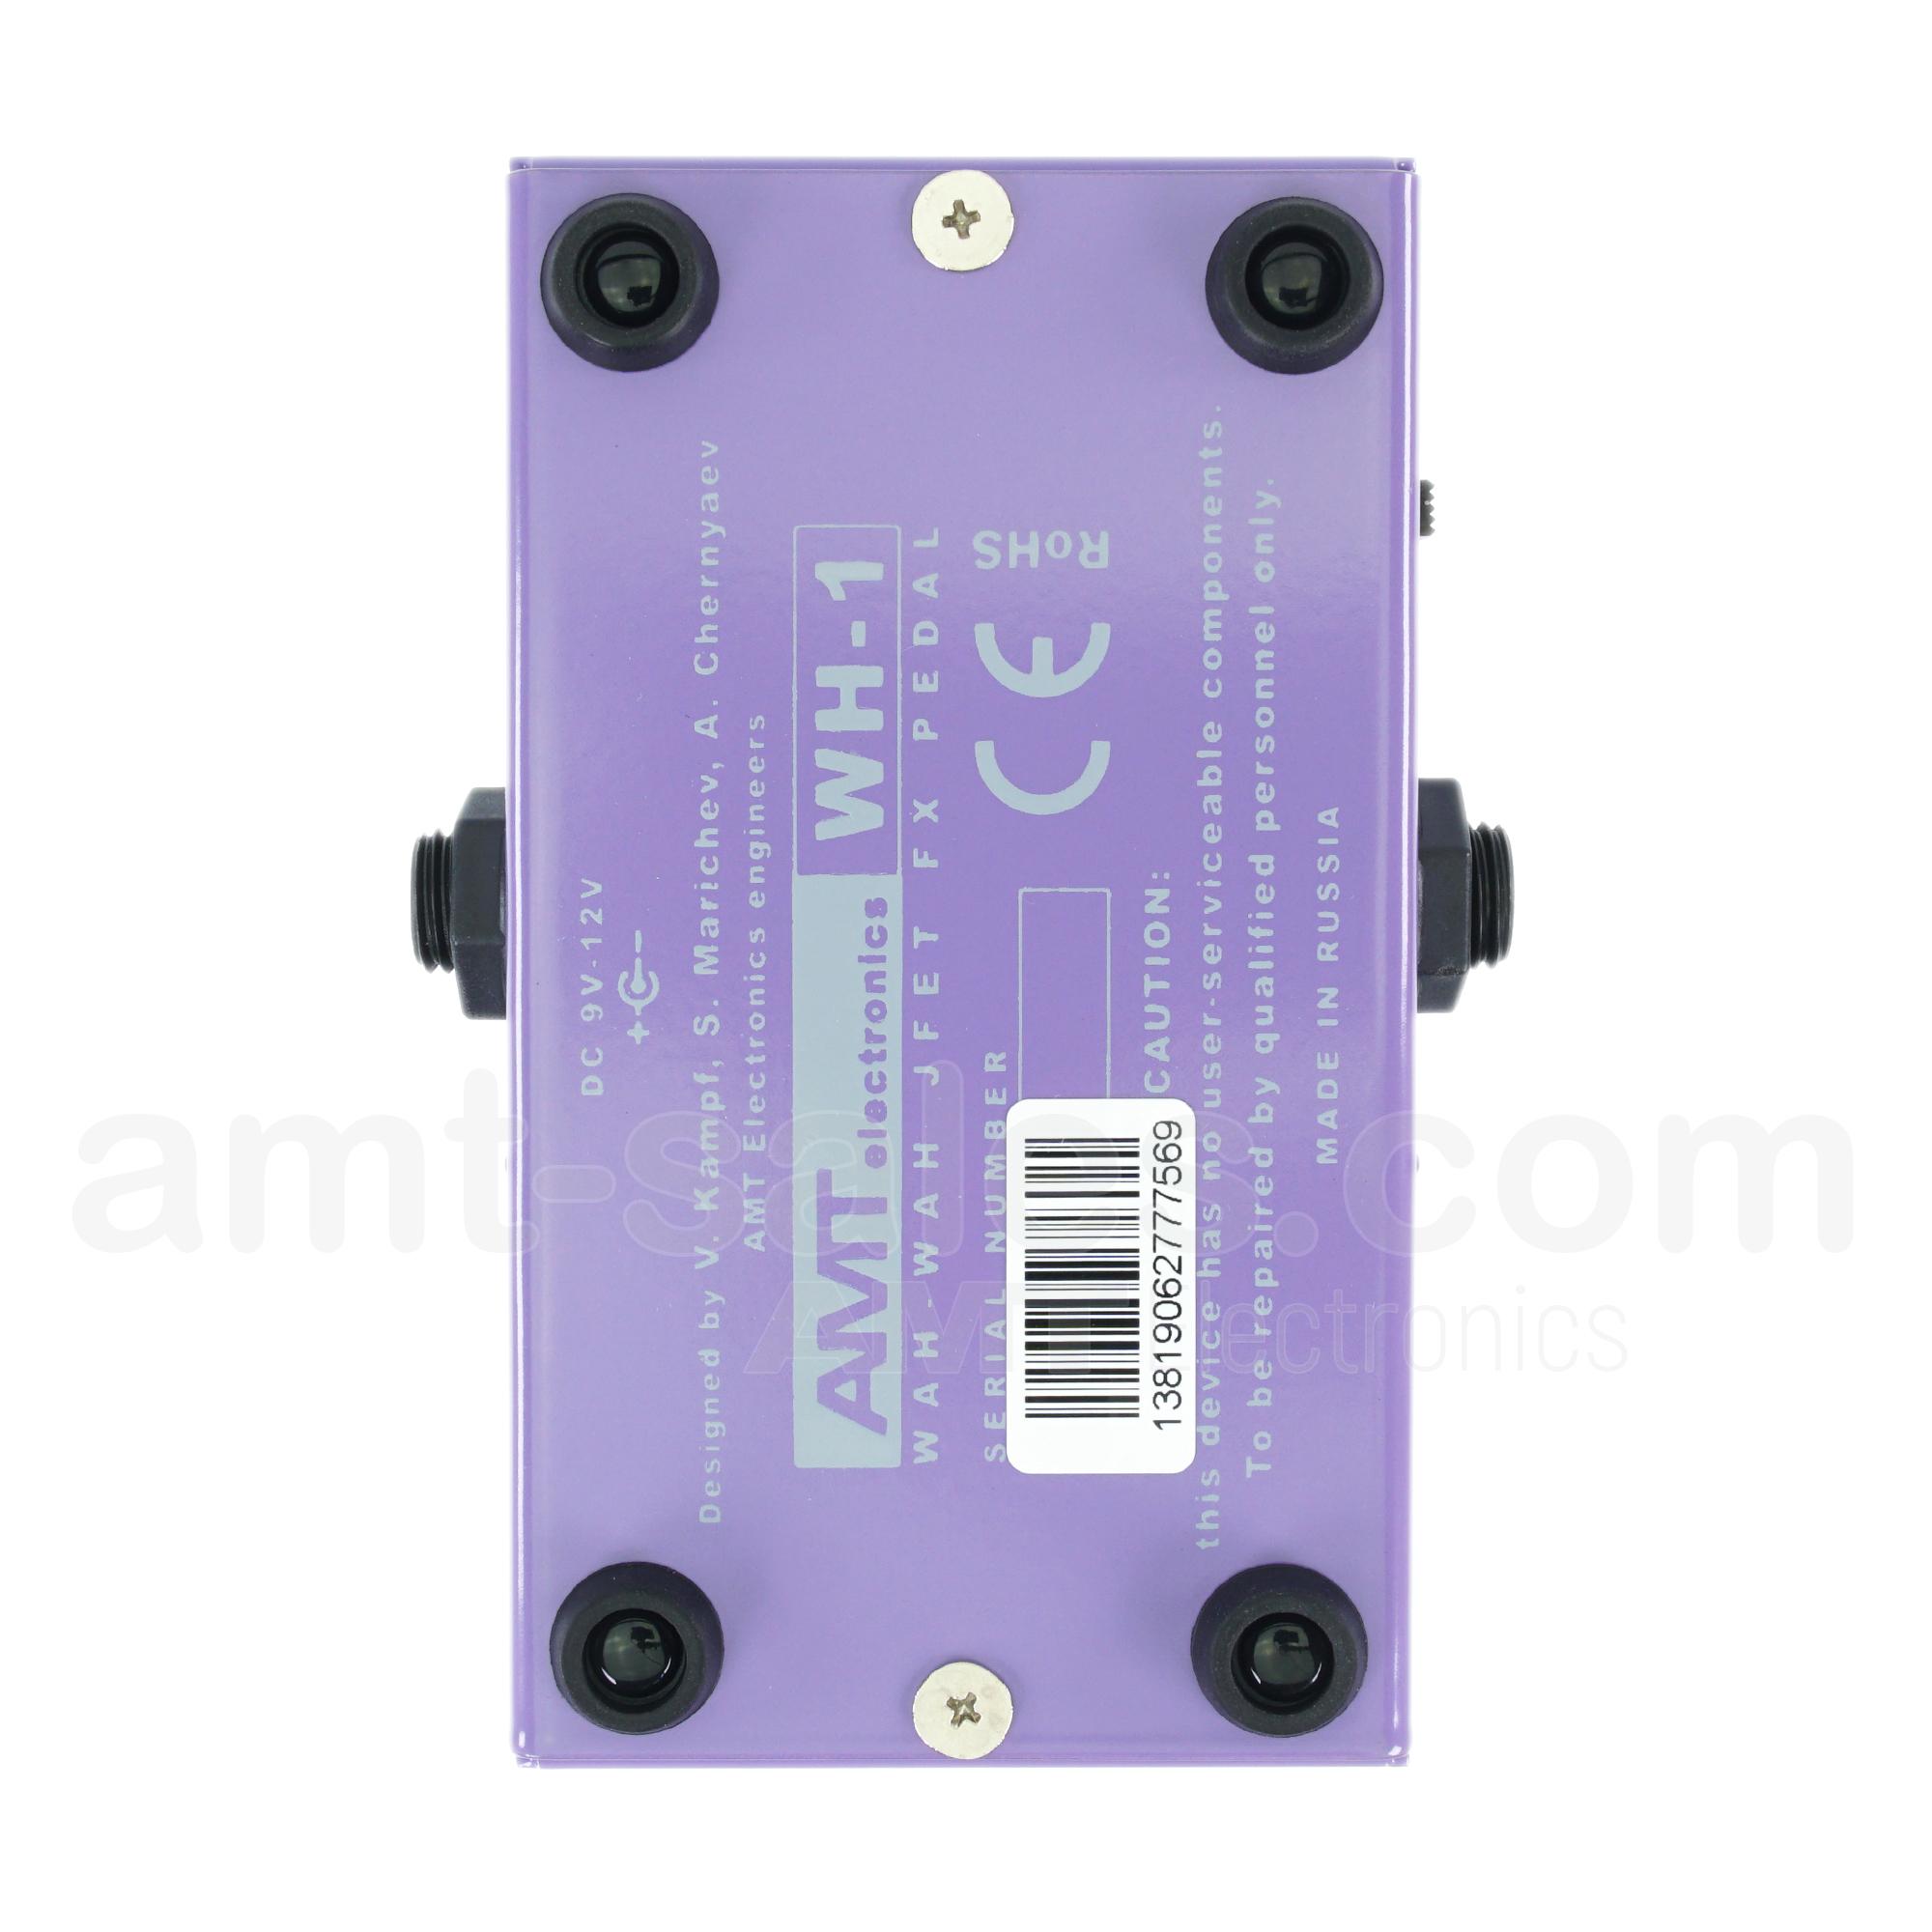 AMT WH-1 - Optical WAH-WAH pedal for guitar